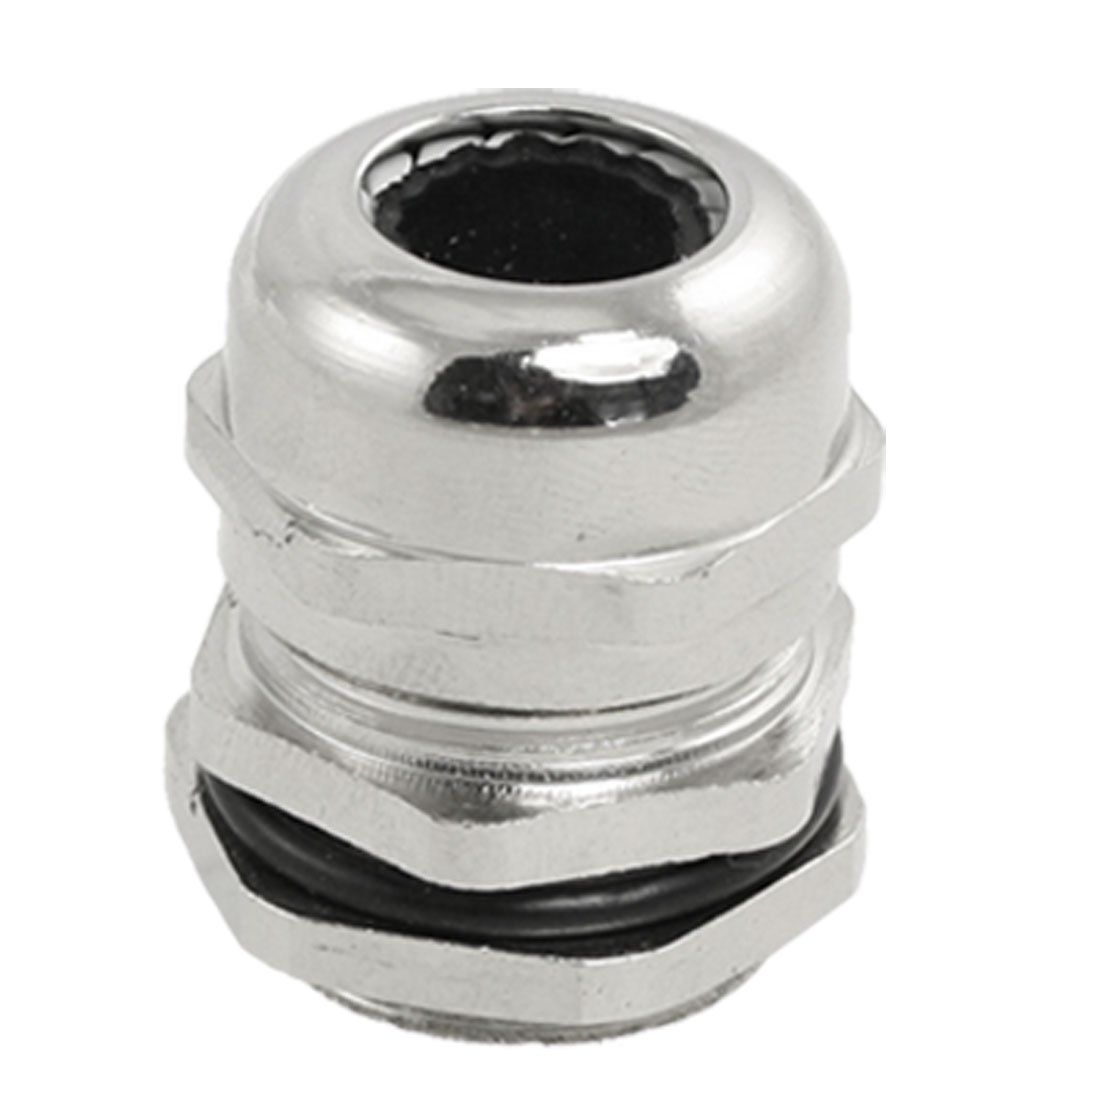 3 Stück 20mm Gewinde PG13.5 Wasserdichtes Edelstahl Kabelverschraubung Gelenk